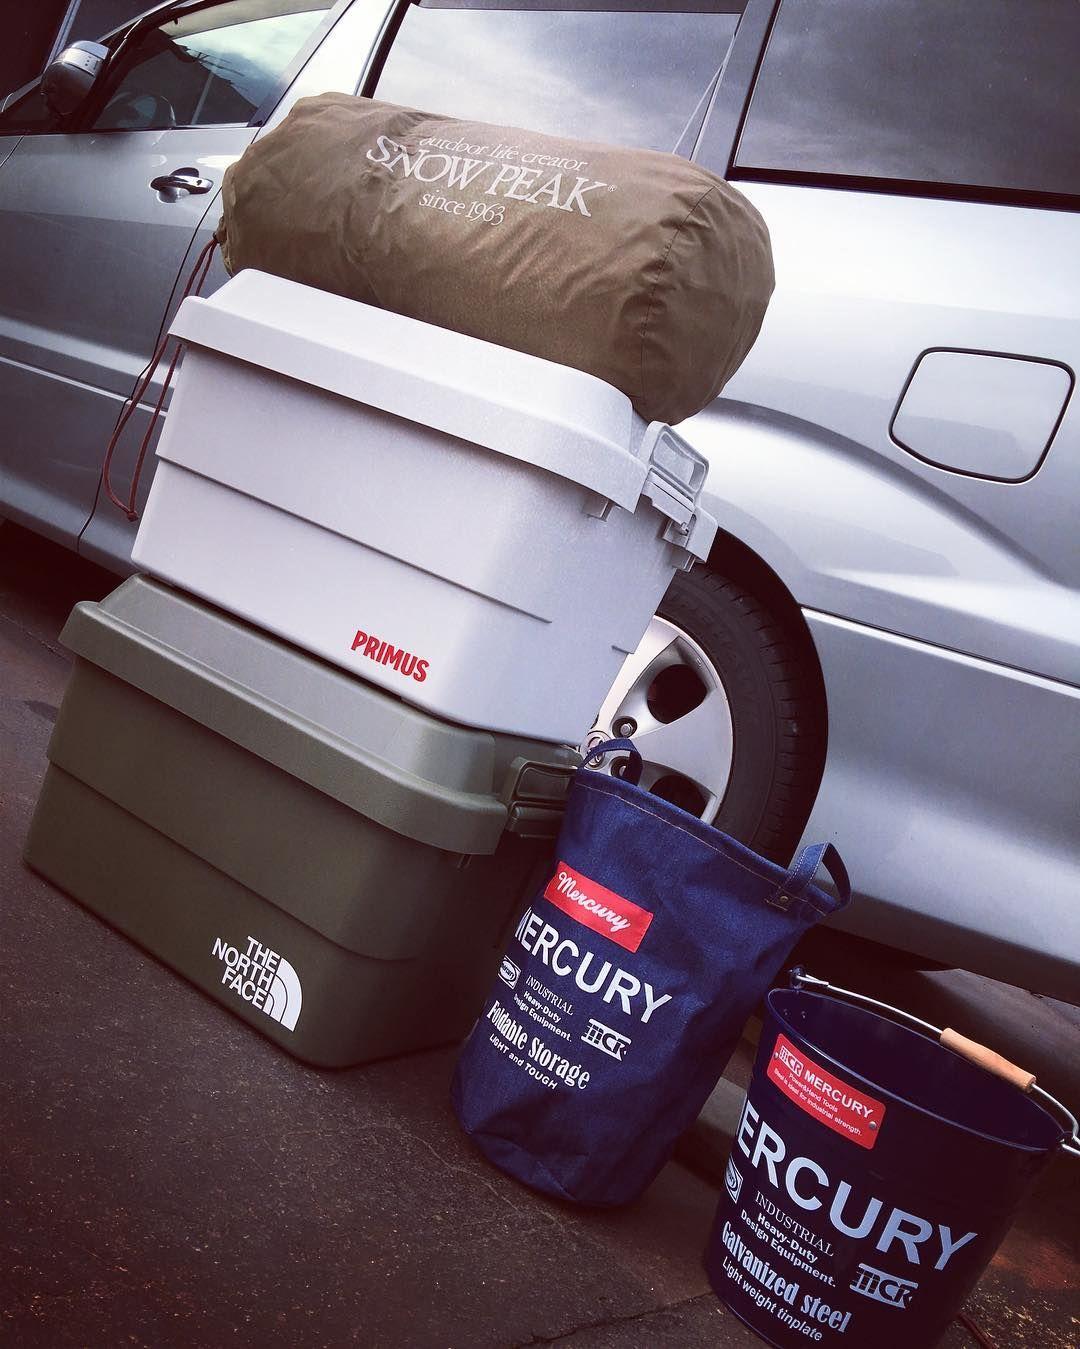 Supreme 車用収納ボックス おしゃれ トランクボックス シュプリーム カー用収納ボックス 大容量 折り畳み式 収納ボックス おしゃれ カー カーアクセサリー